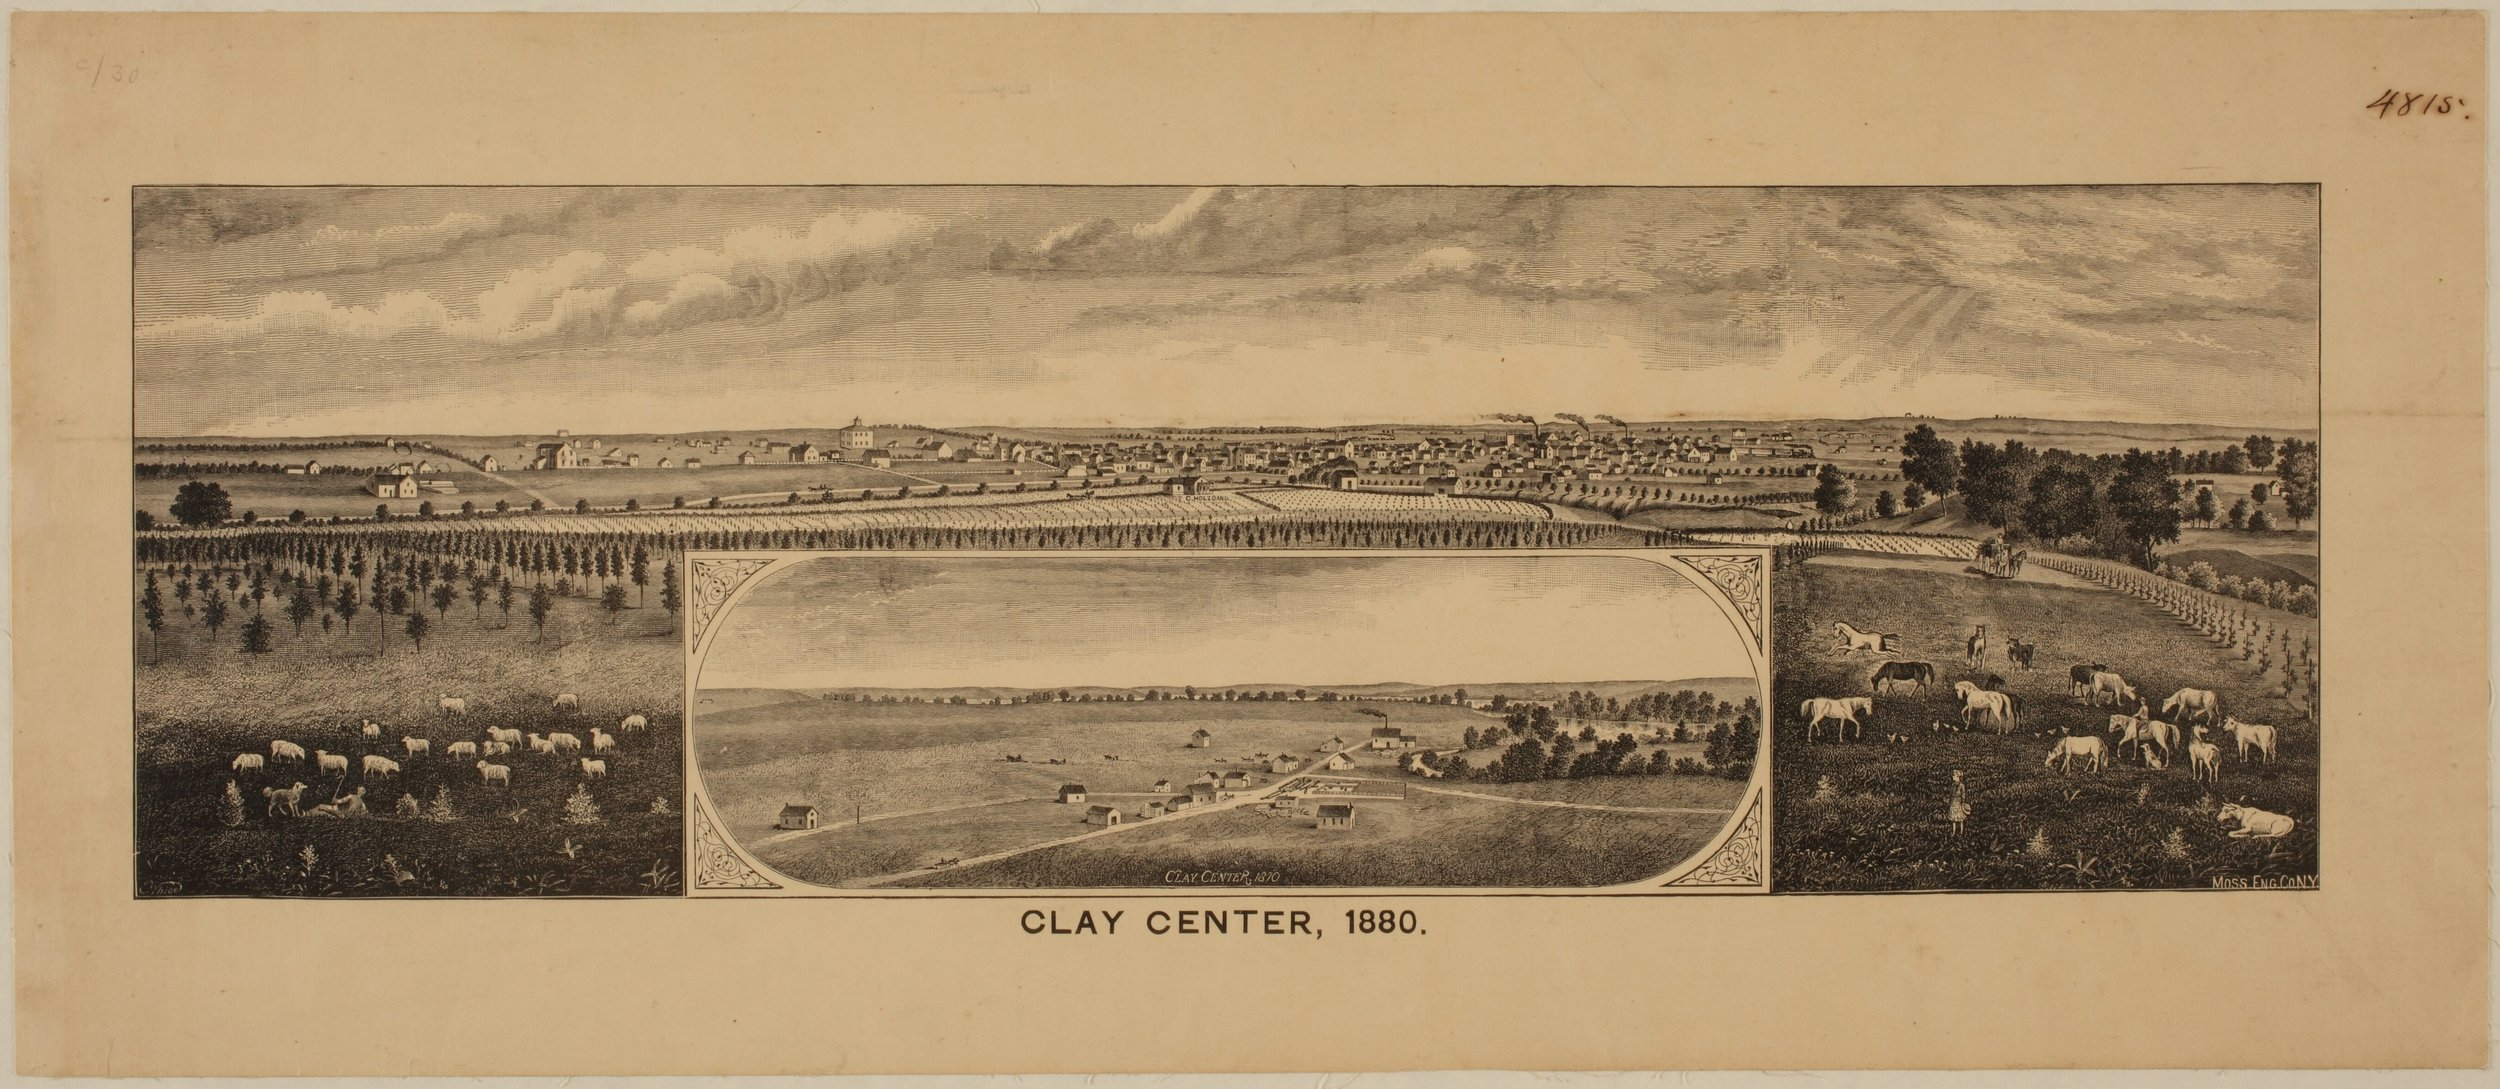 Bird's Eye View of Clay Center, Clay County, Kansas